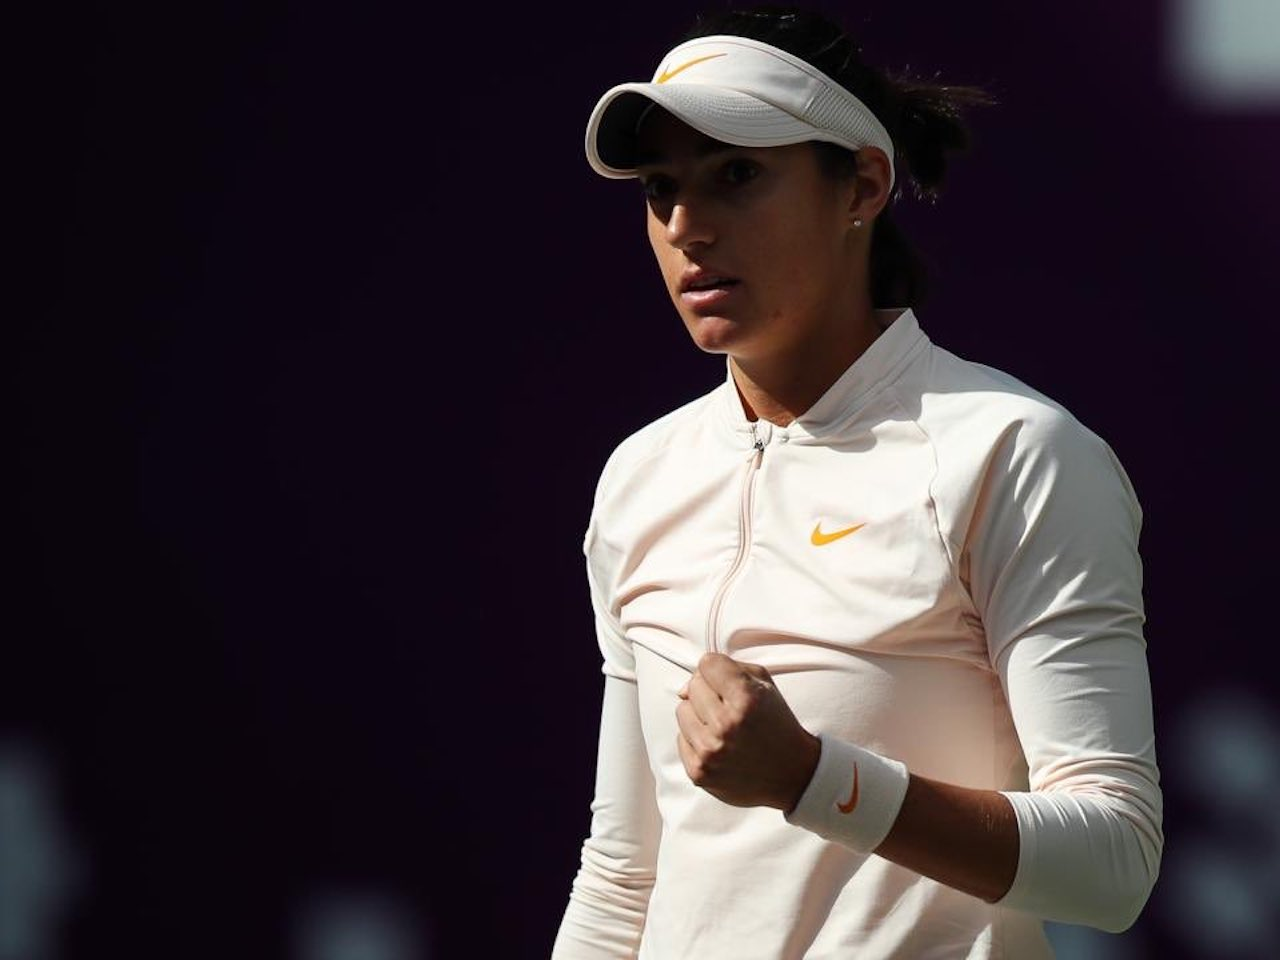 Caroline Garcia qualifiée pour la finale — Tianjin